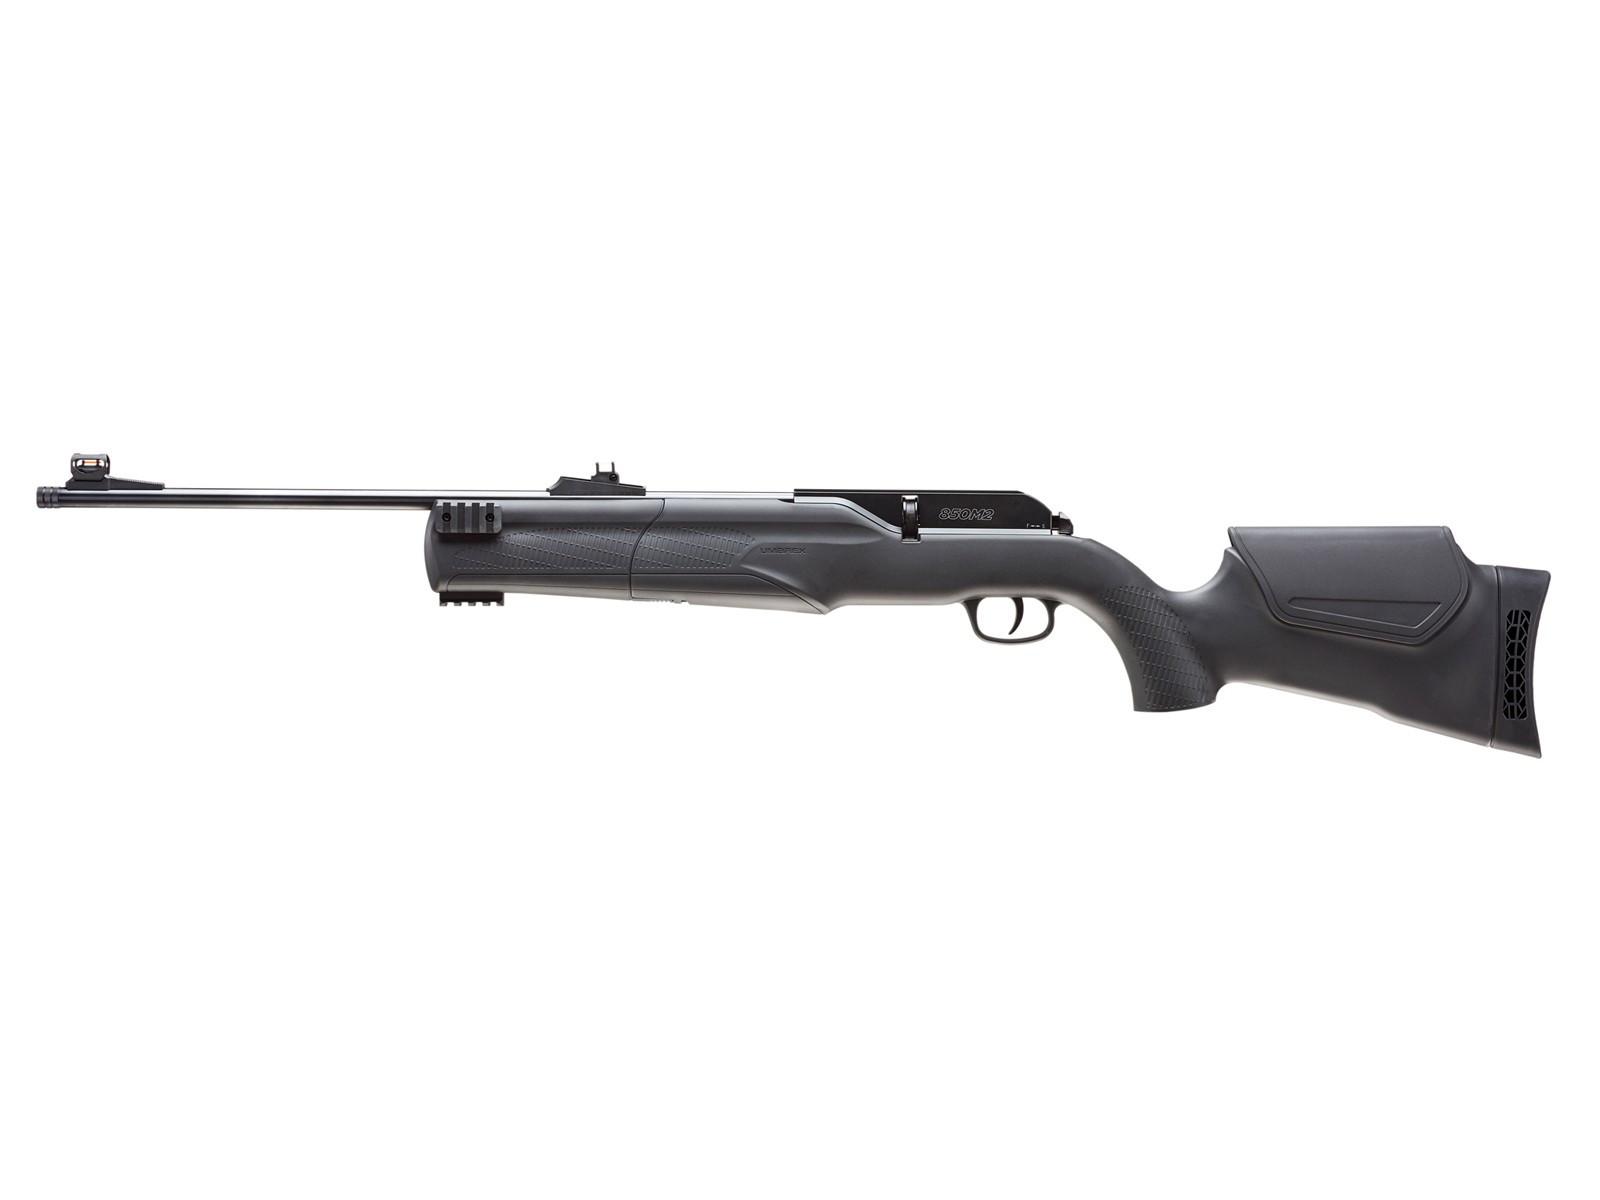 Umarex 850M2 Pellet Gun